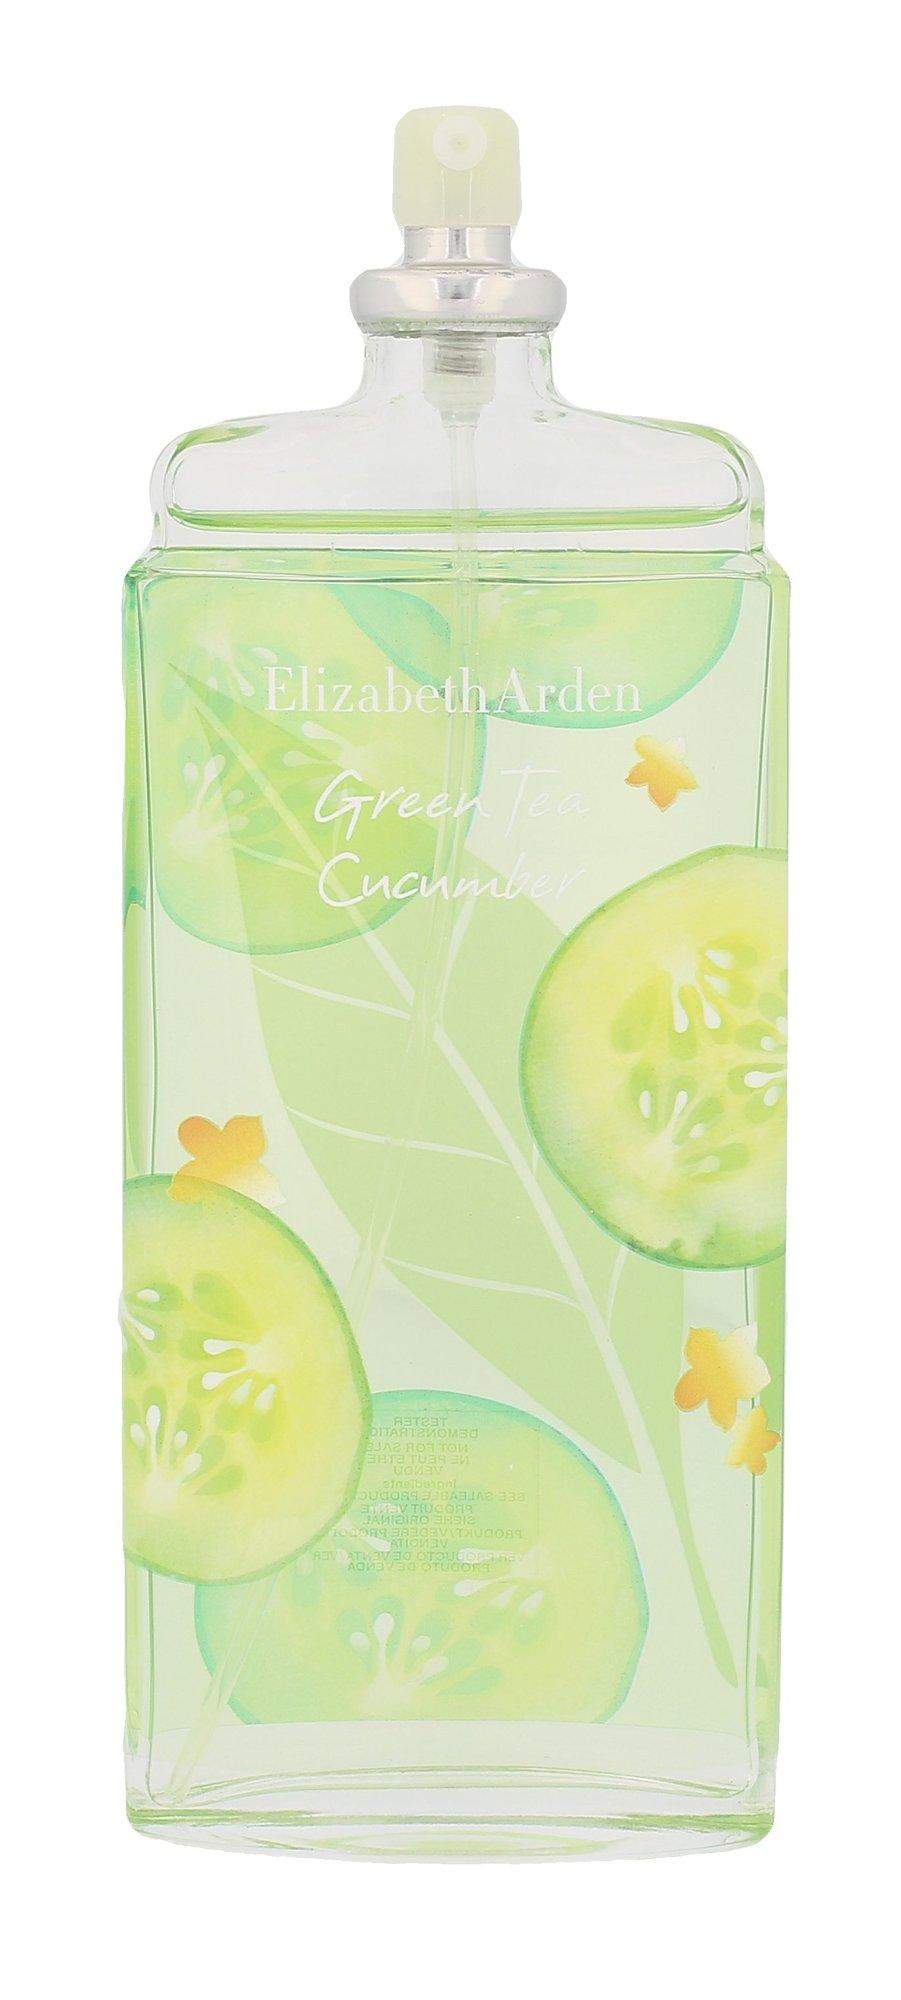 Elizabeth Arden Green Tea Cucumber EDT 100ml